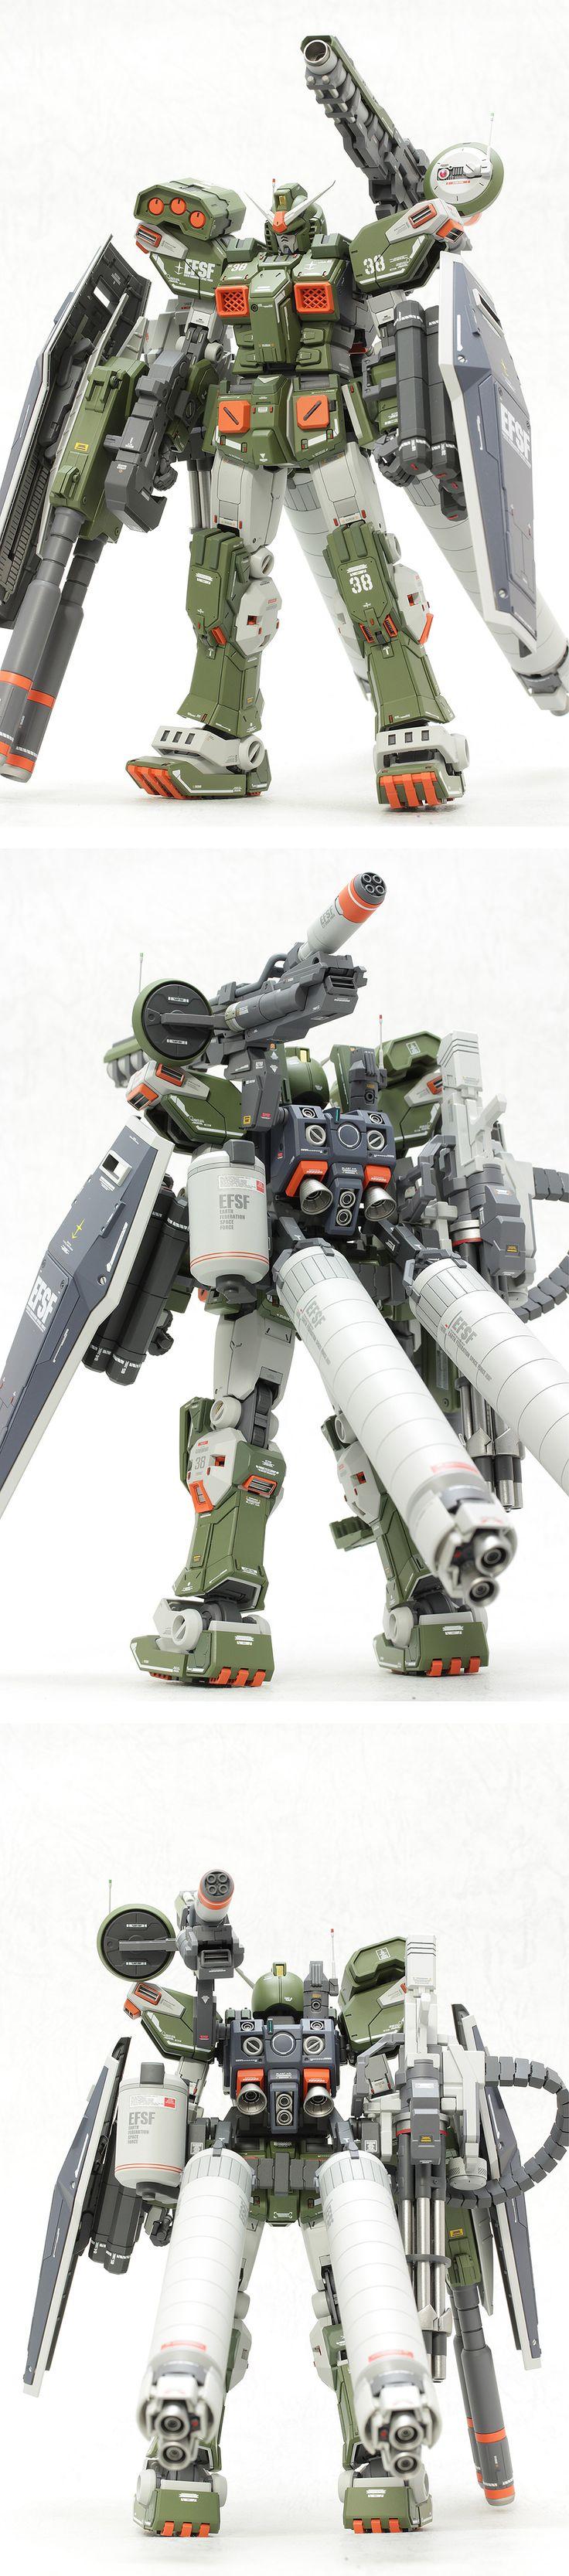 YU-SUKE'S FACTORY: AMAZING MG 1/100 FULL ARMOR GUNDAM MSV CUSTOM. FULL PHOTOREVIEW !!! http://www.gunjap.net/site/?p=332340